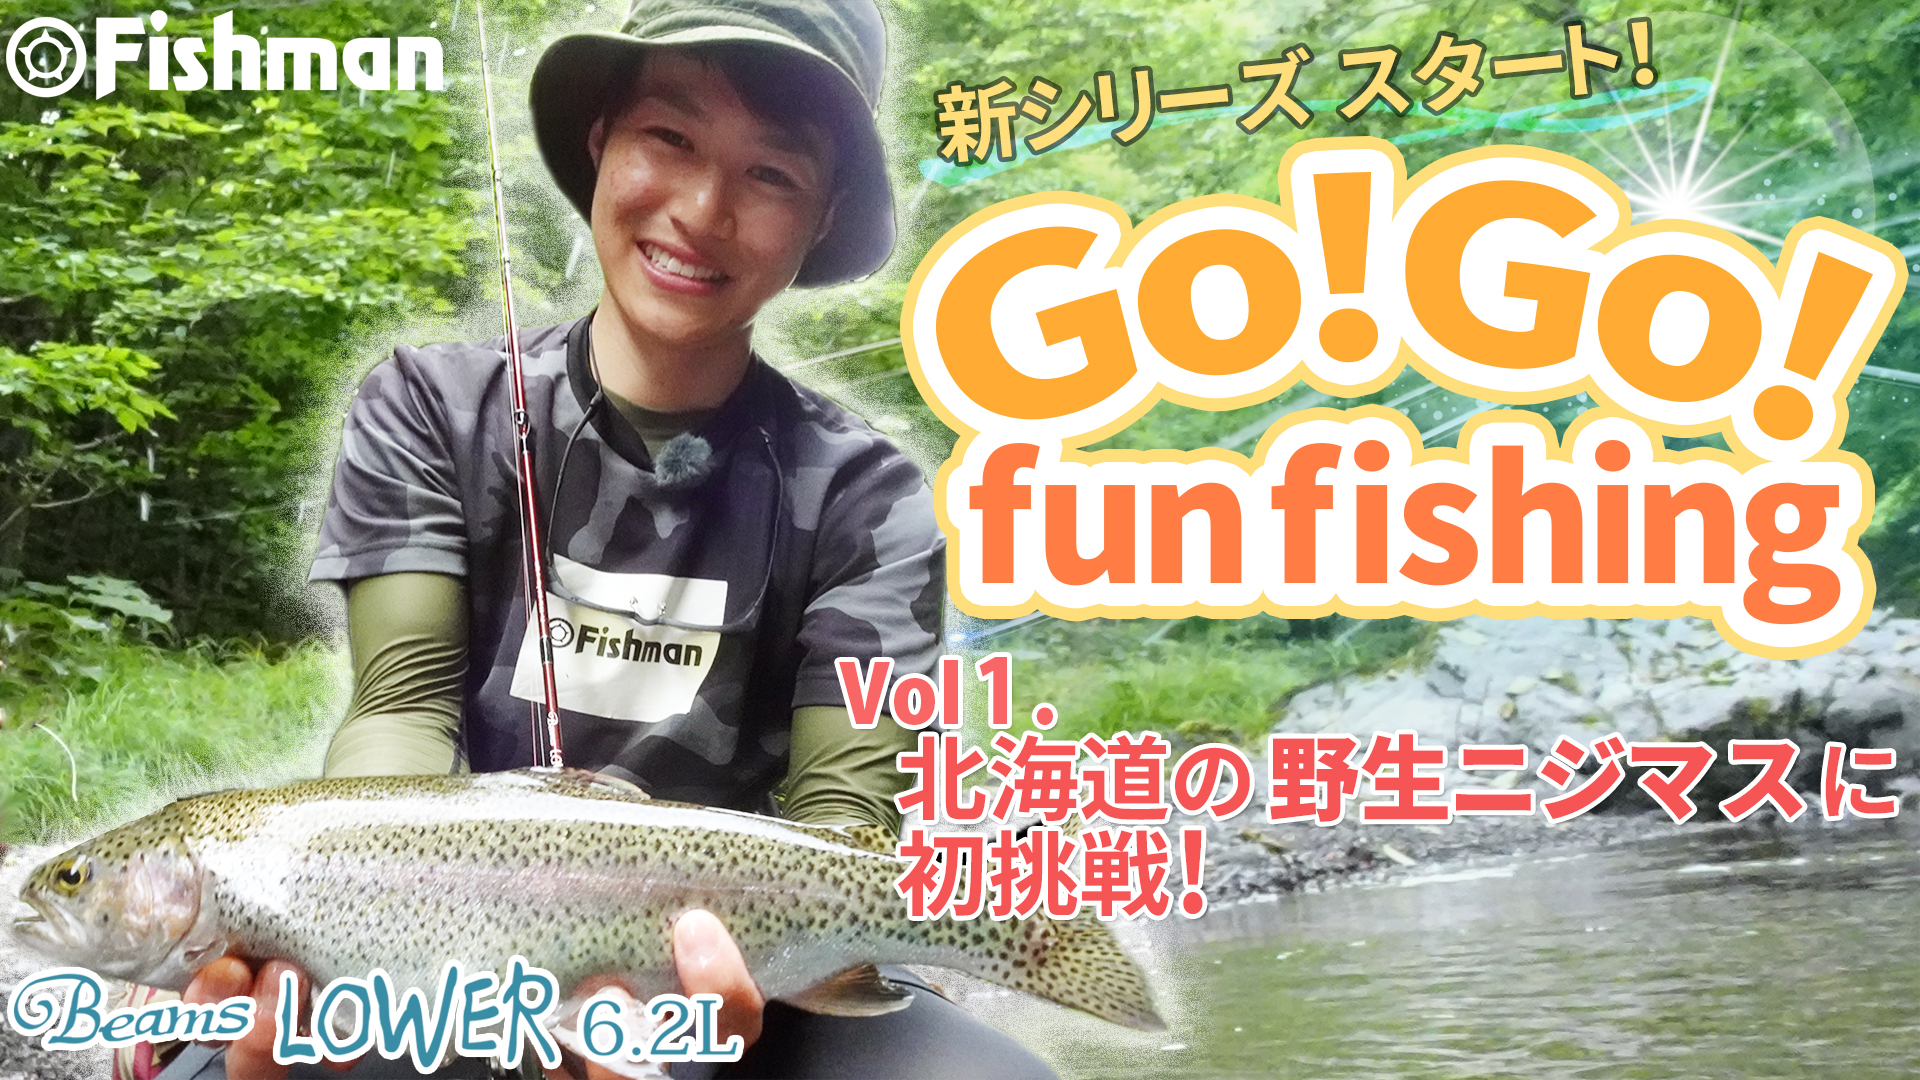 FishmanTV 新シリーズ『高木響 GO!GO! fun fishing』公開